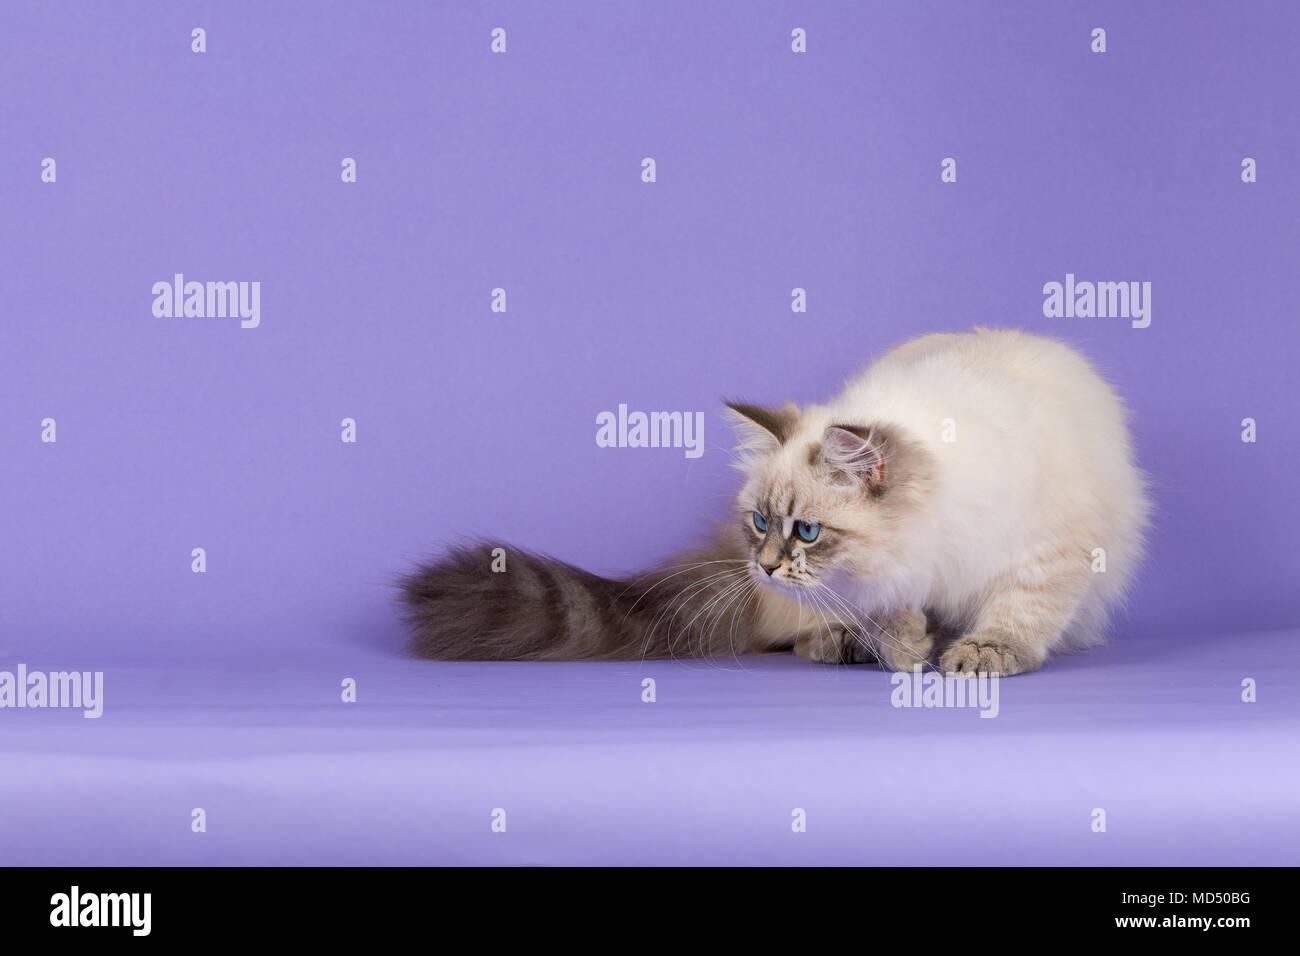 Amazing Siberian cat hunting on purple - Stock Image